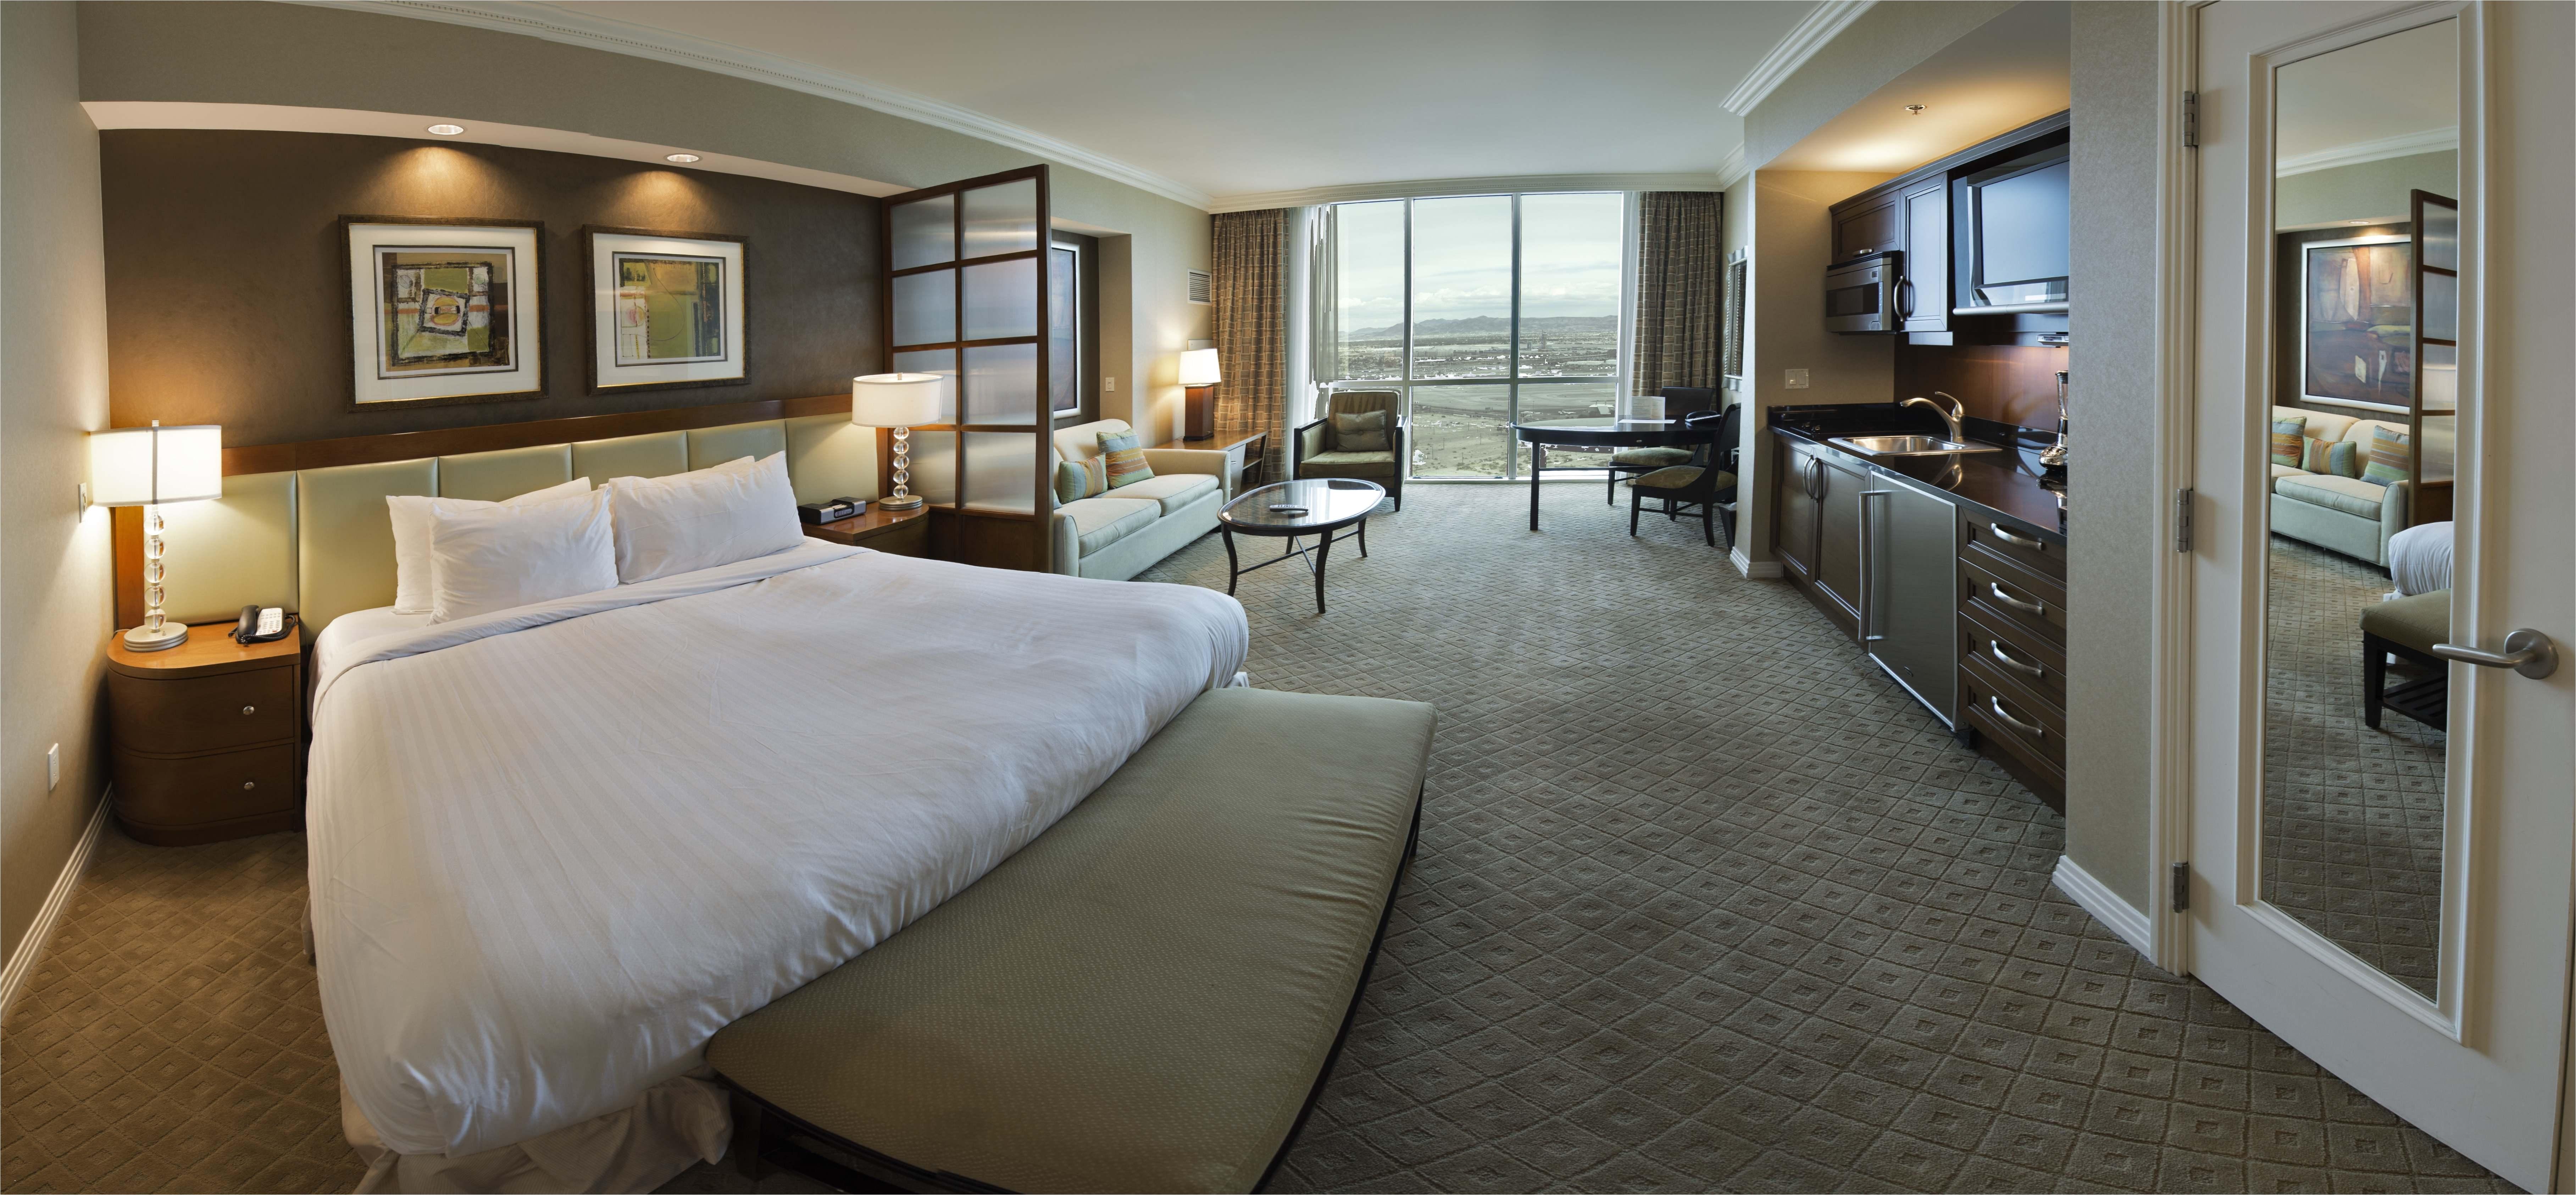 26 orlando 2 bedroom suites impressive three bedroom suite las vegas gorgeous 3 bedroom suites las